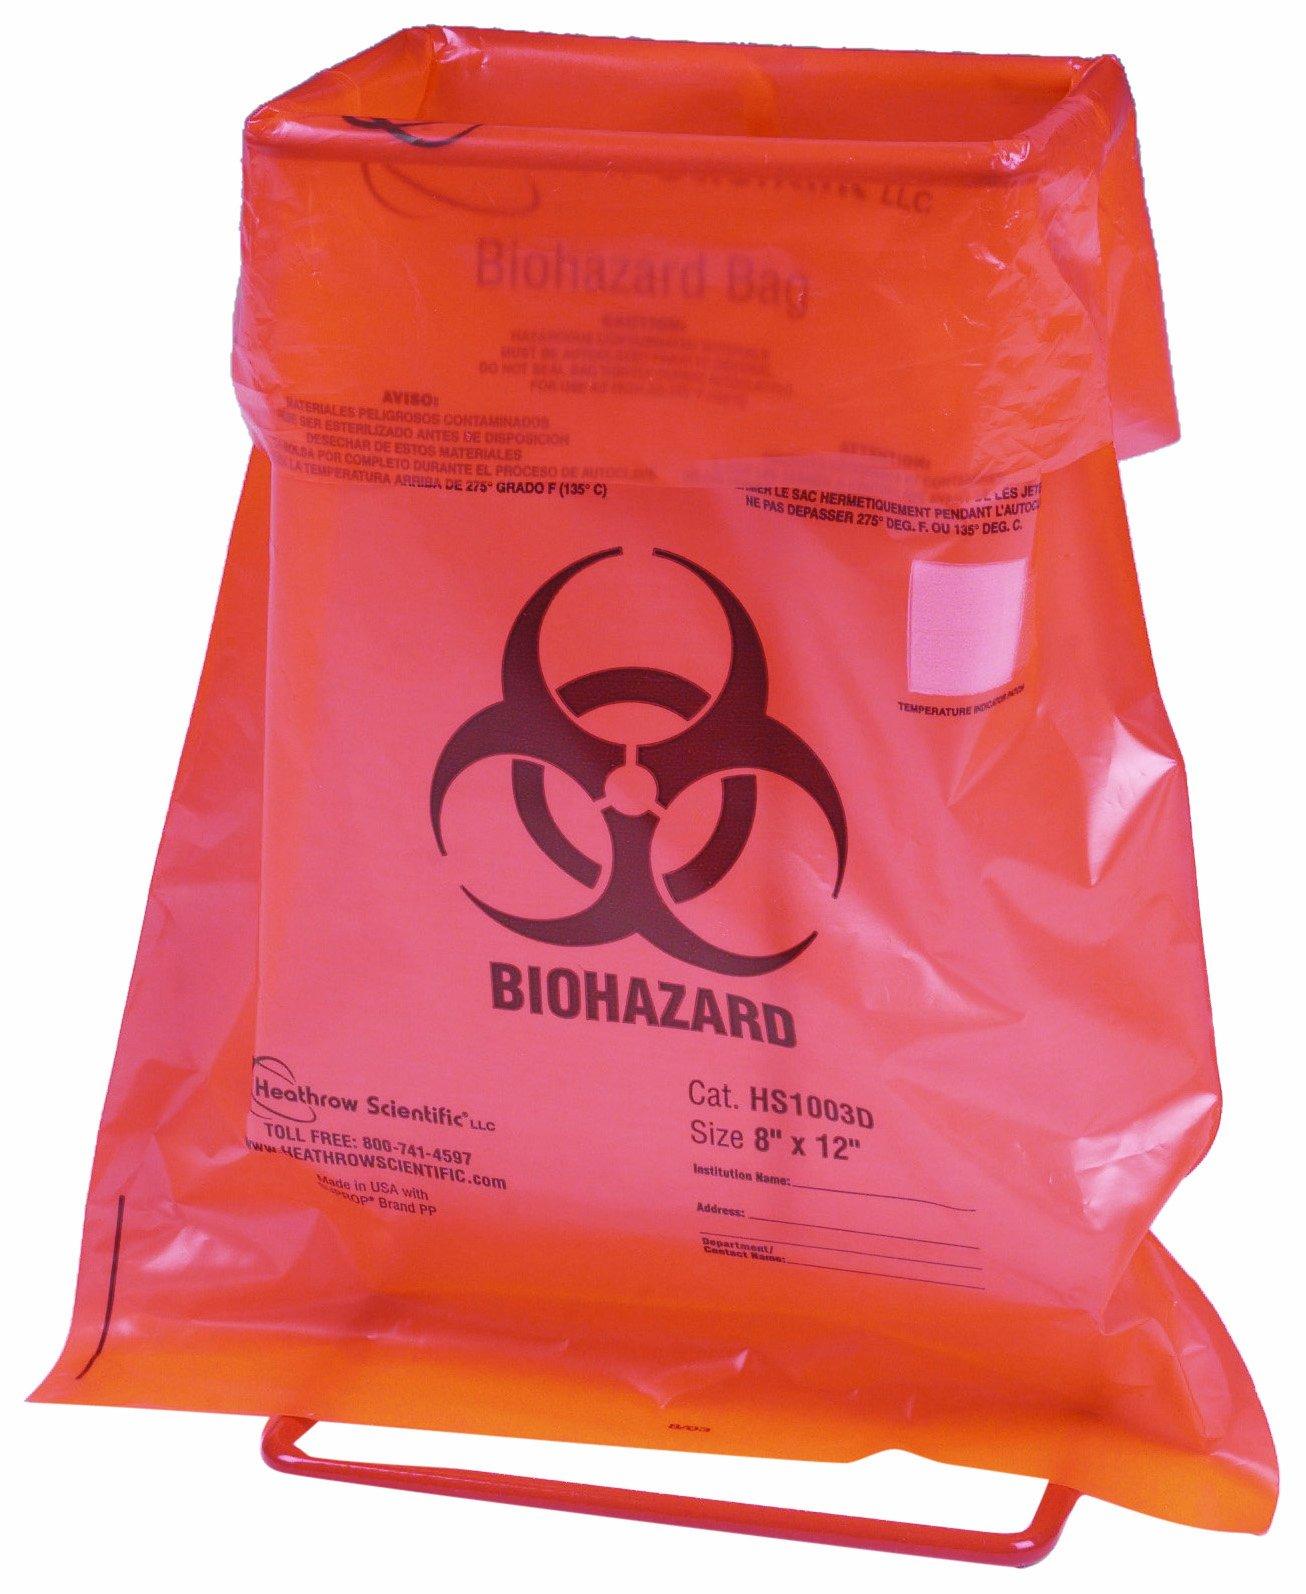 Heathrow Scientific HS10044H Biohazard Bag Holder, Steel Wire, Epoxy Coated, 3.58'' x 5.03'' x .82'' in (9.1 x 12.8 x 2.1 cm), Red, 1/ea by Heathrow Scientific